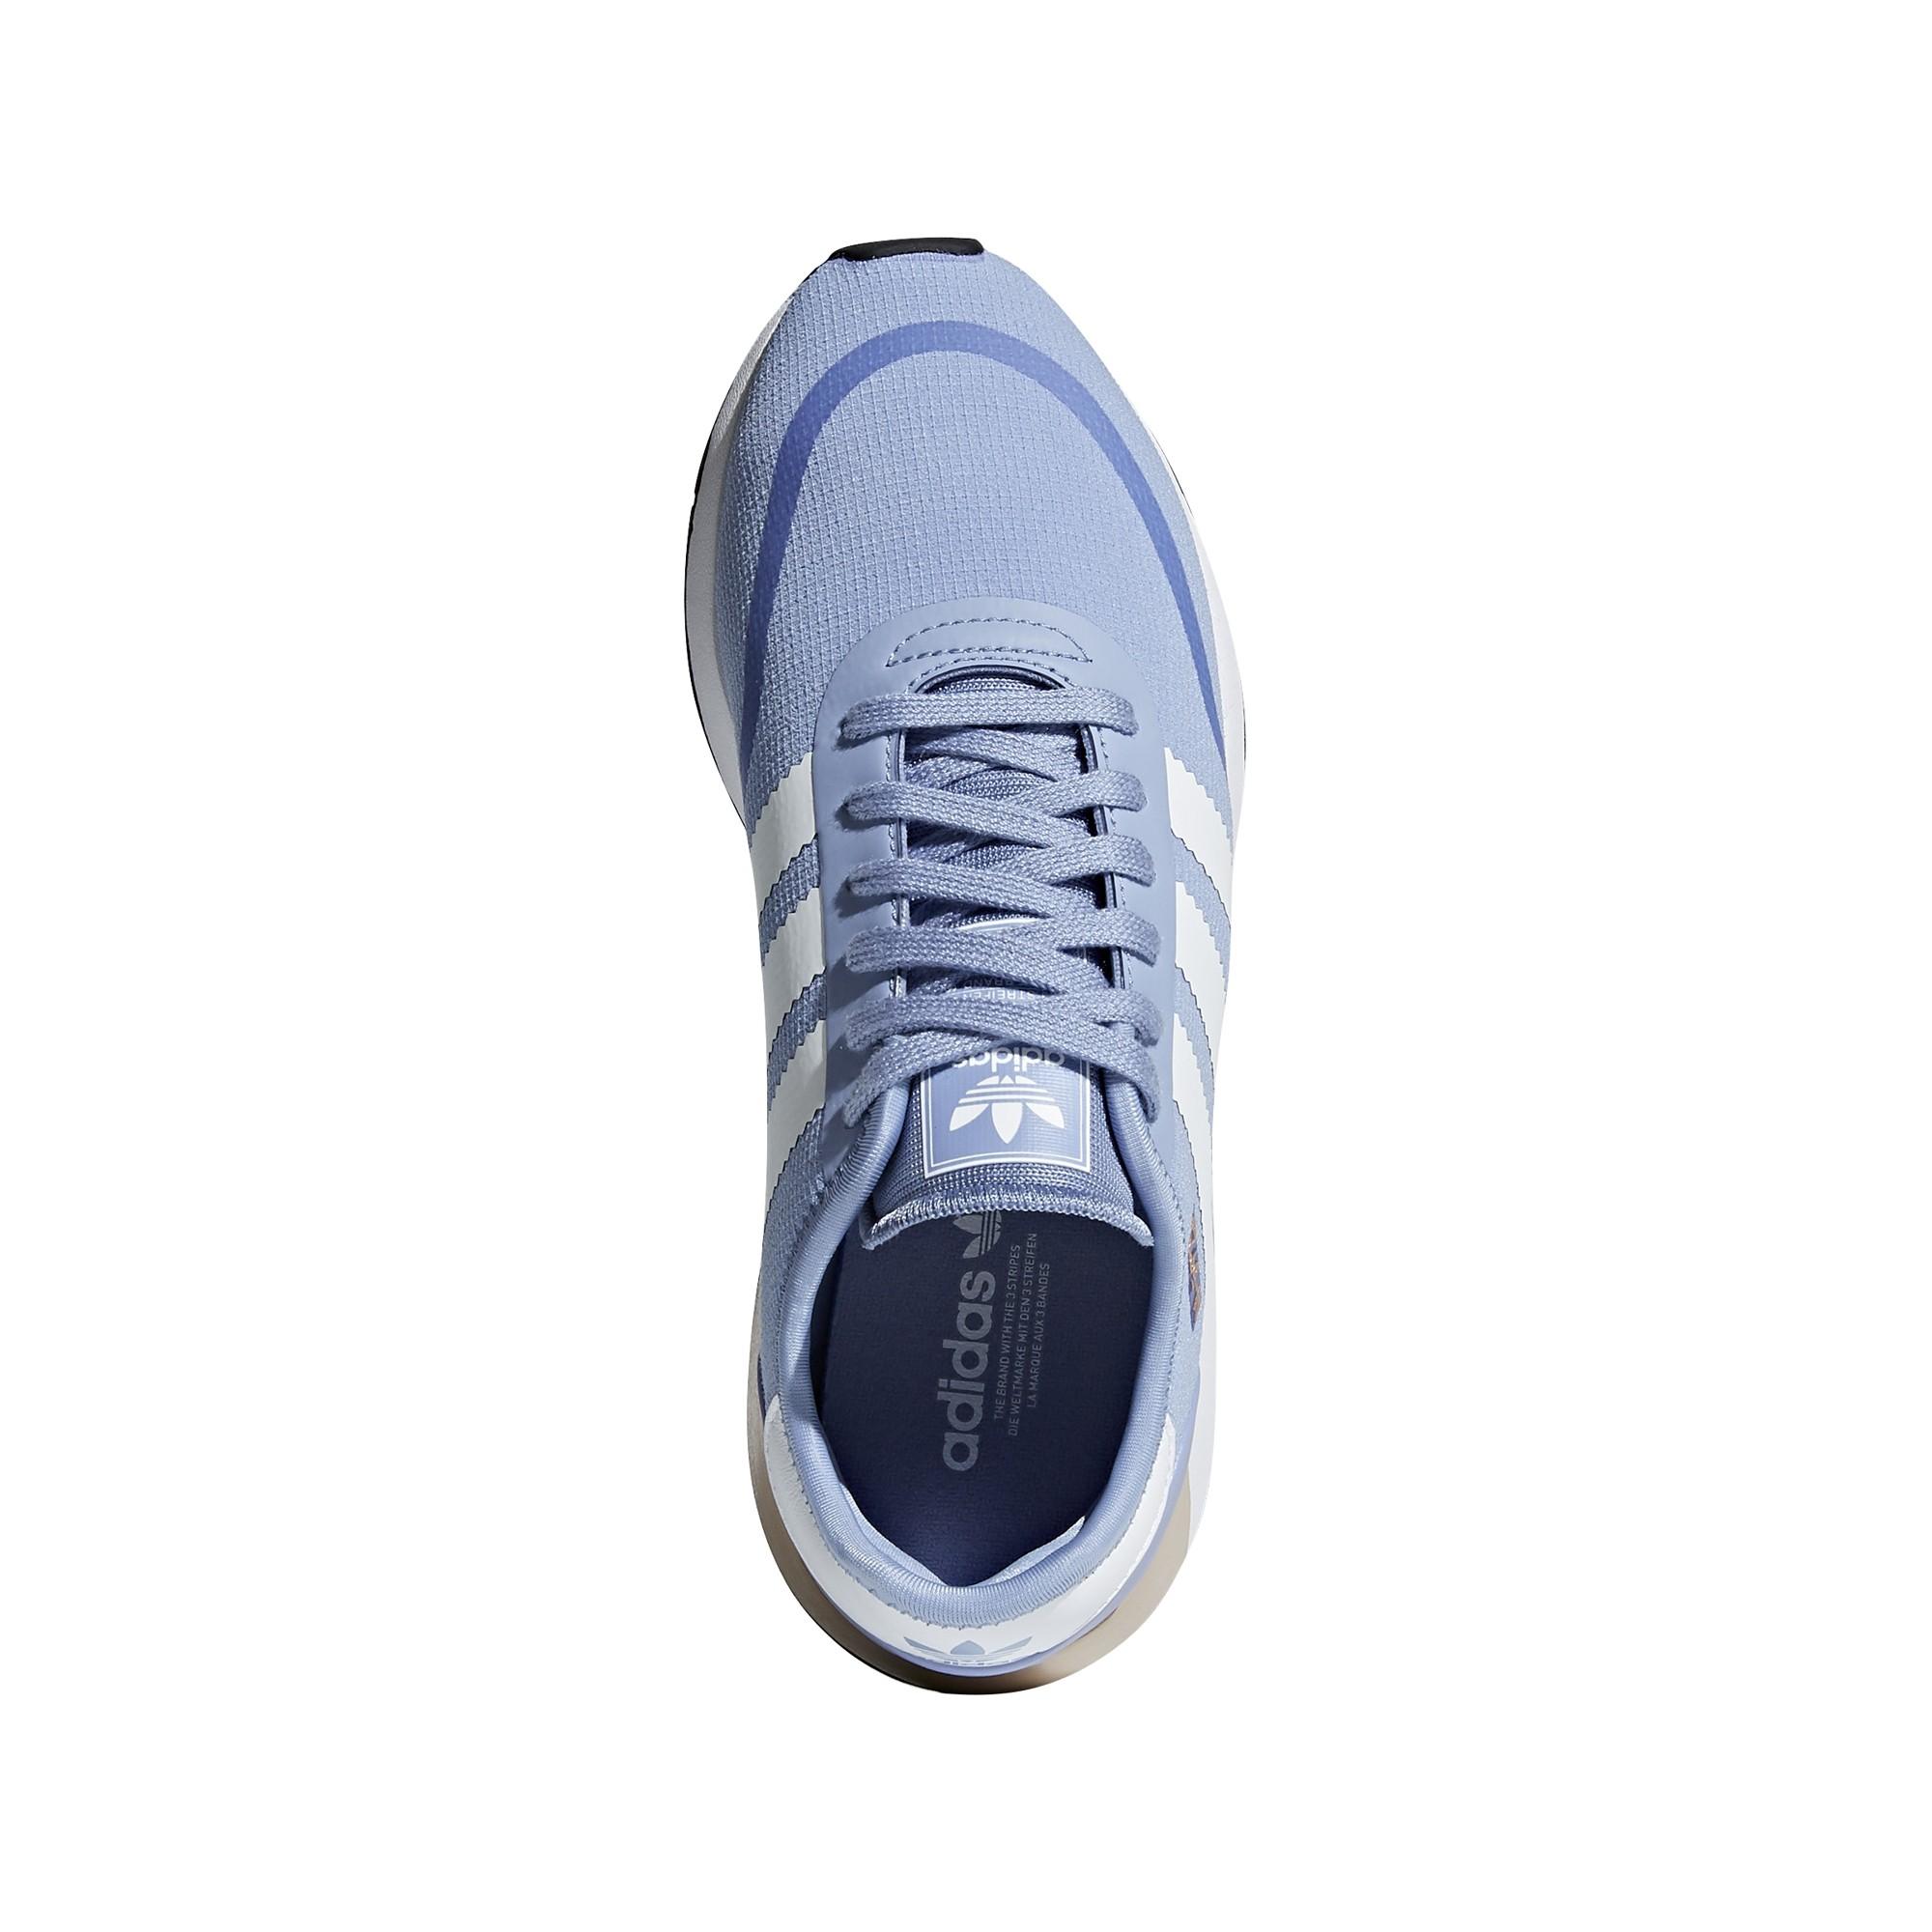 big sale bc53e 494ba Azzurrobianco Iniki Runner Donna Style Aq0268 Acquist Adidas